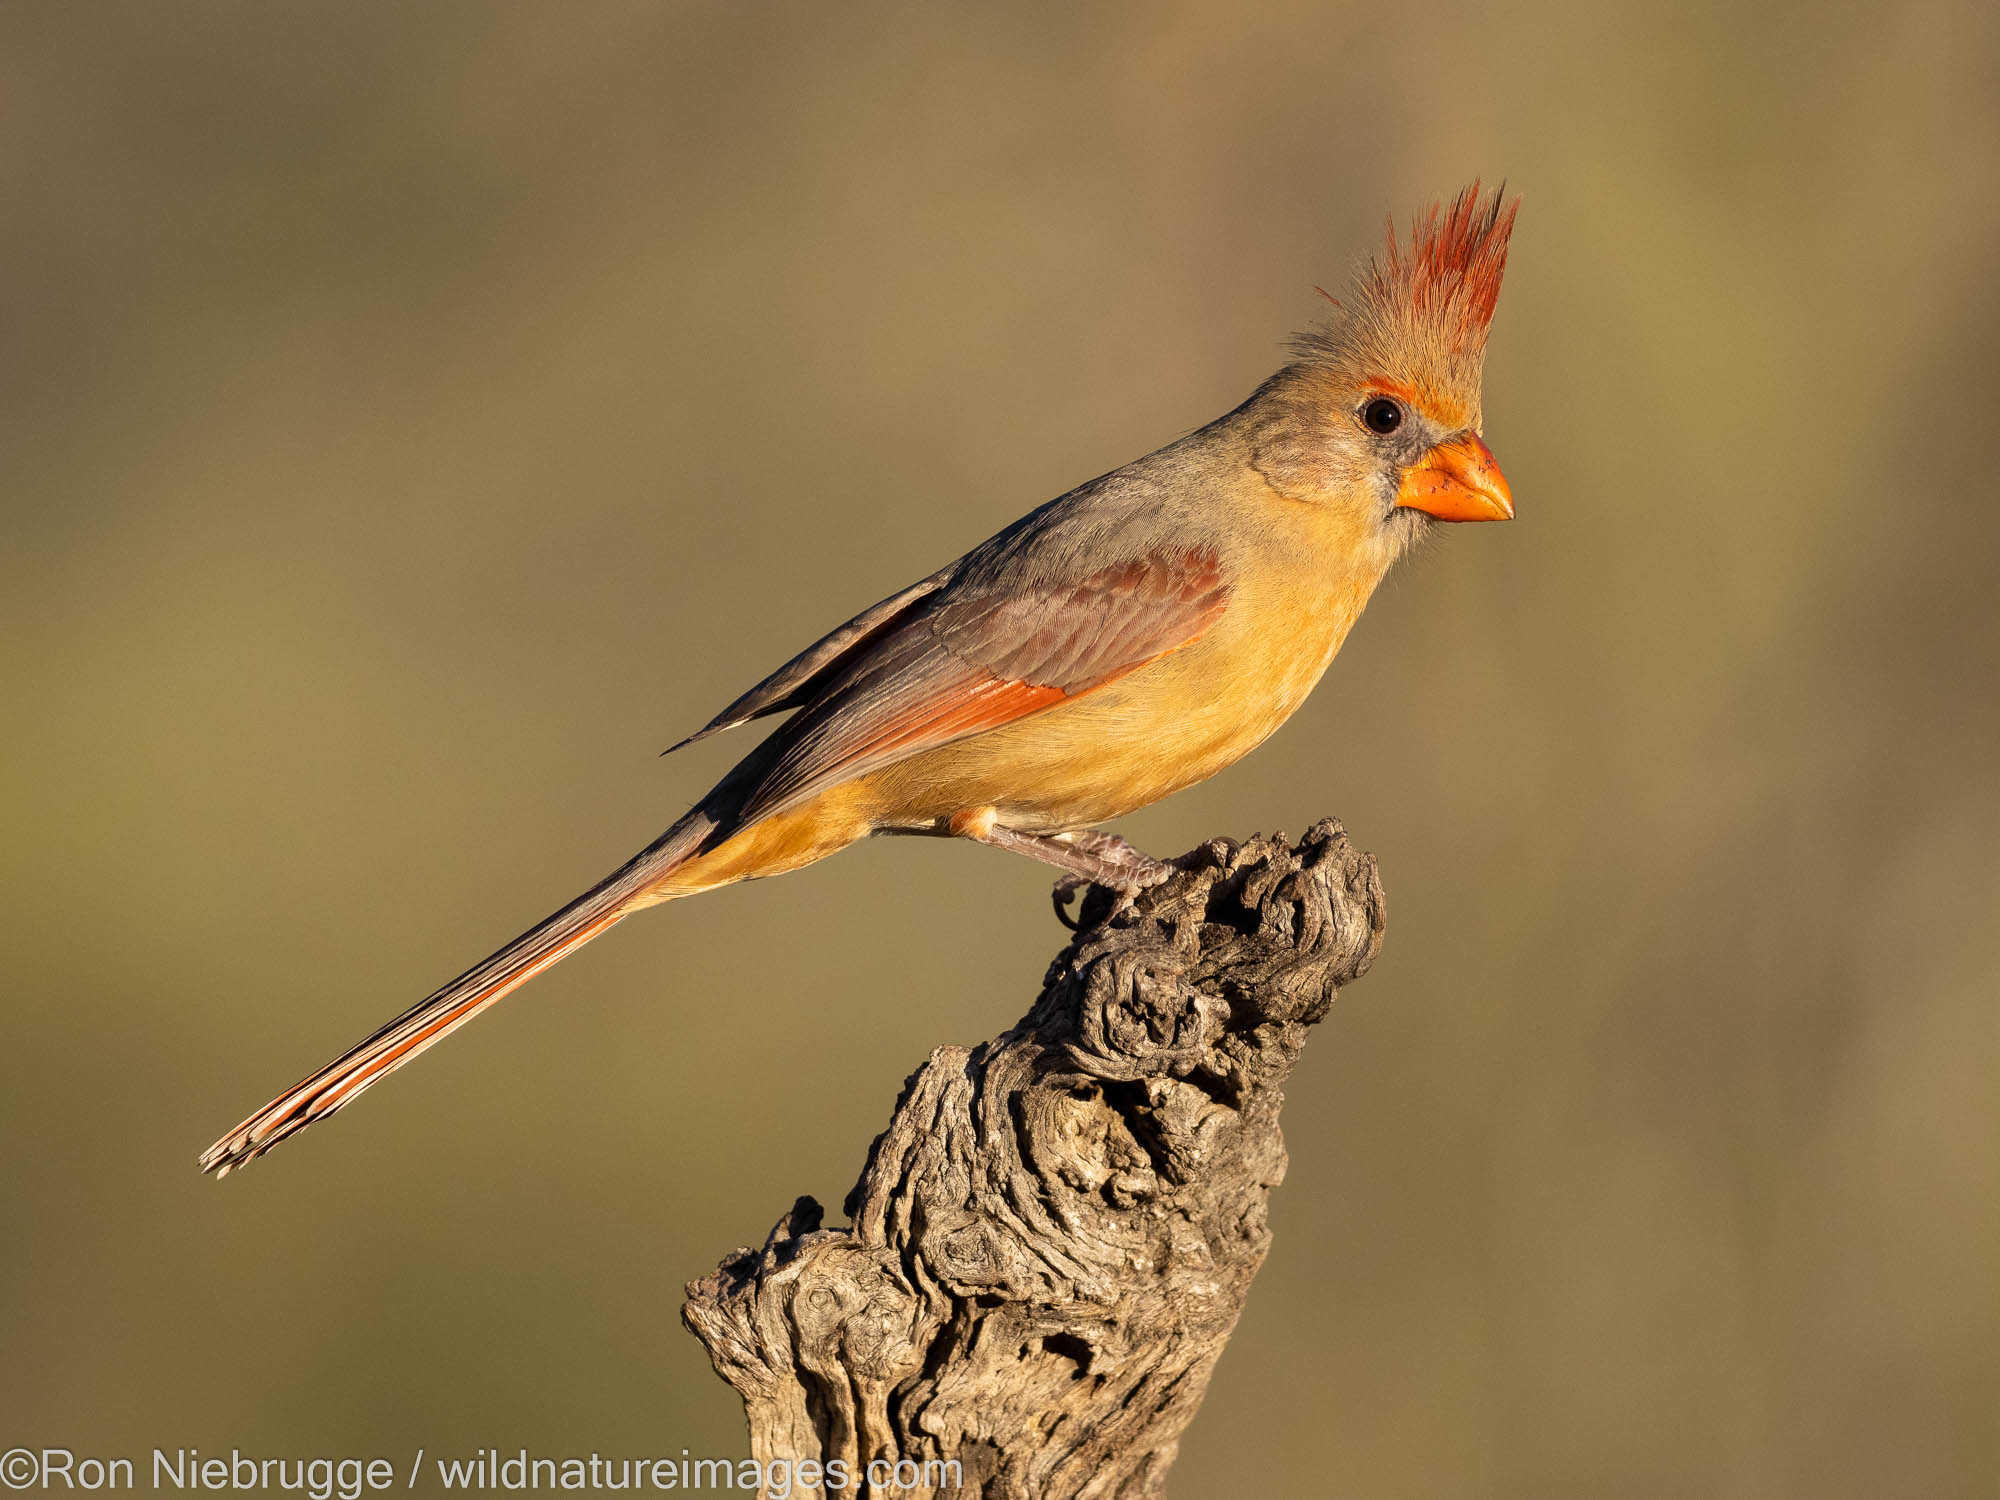 Northern Cardinal, Tortolita Mountains, Marana, near Tucson, Arizona.